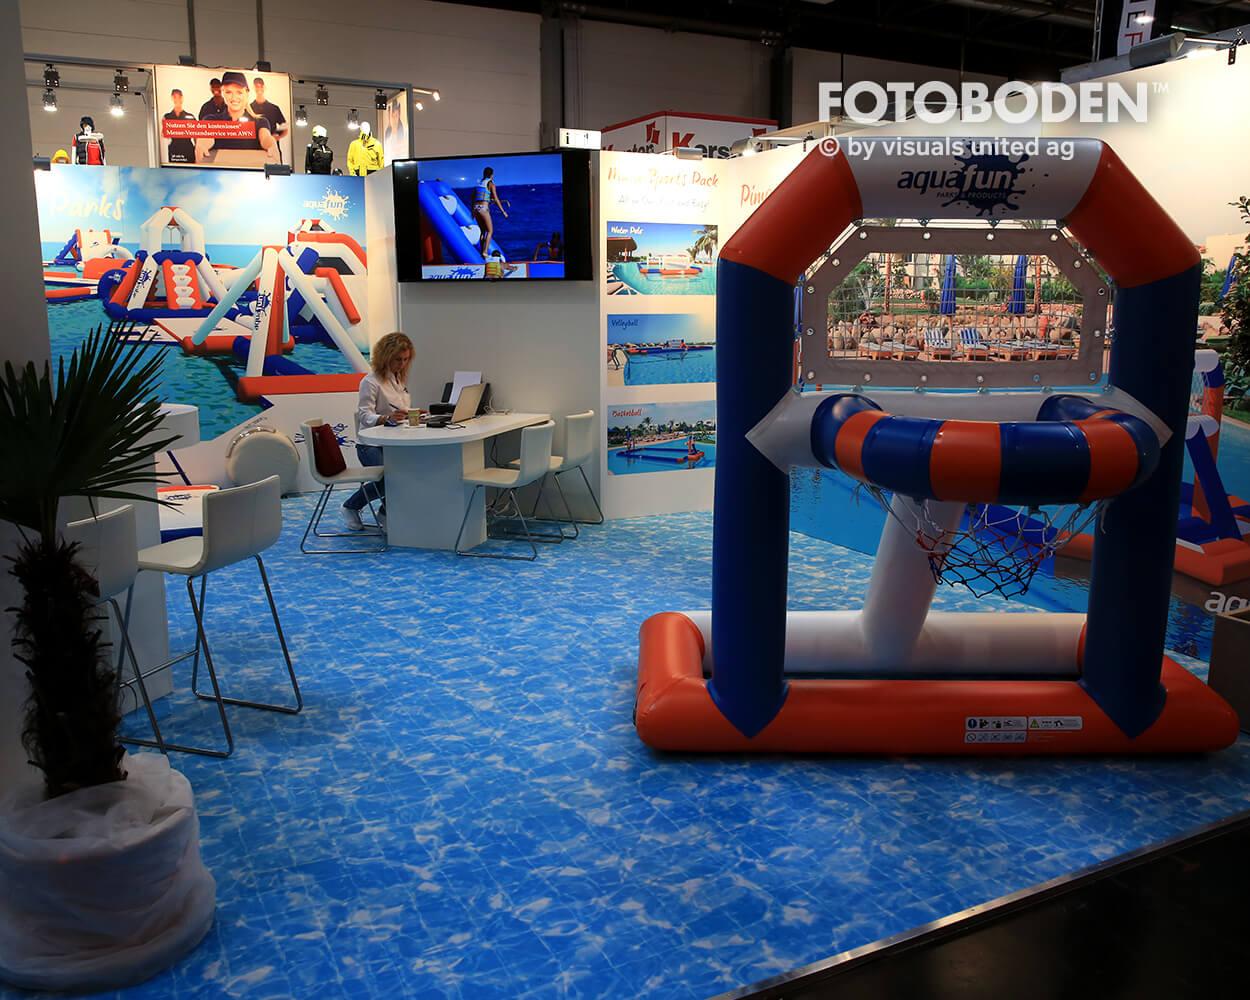 Boot2018 Fotoboden Messeboden Tradeshow Flooring Bodengestaltung Messe Bodendesign Messedesign Design Boden Messegestaltung 9